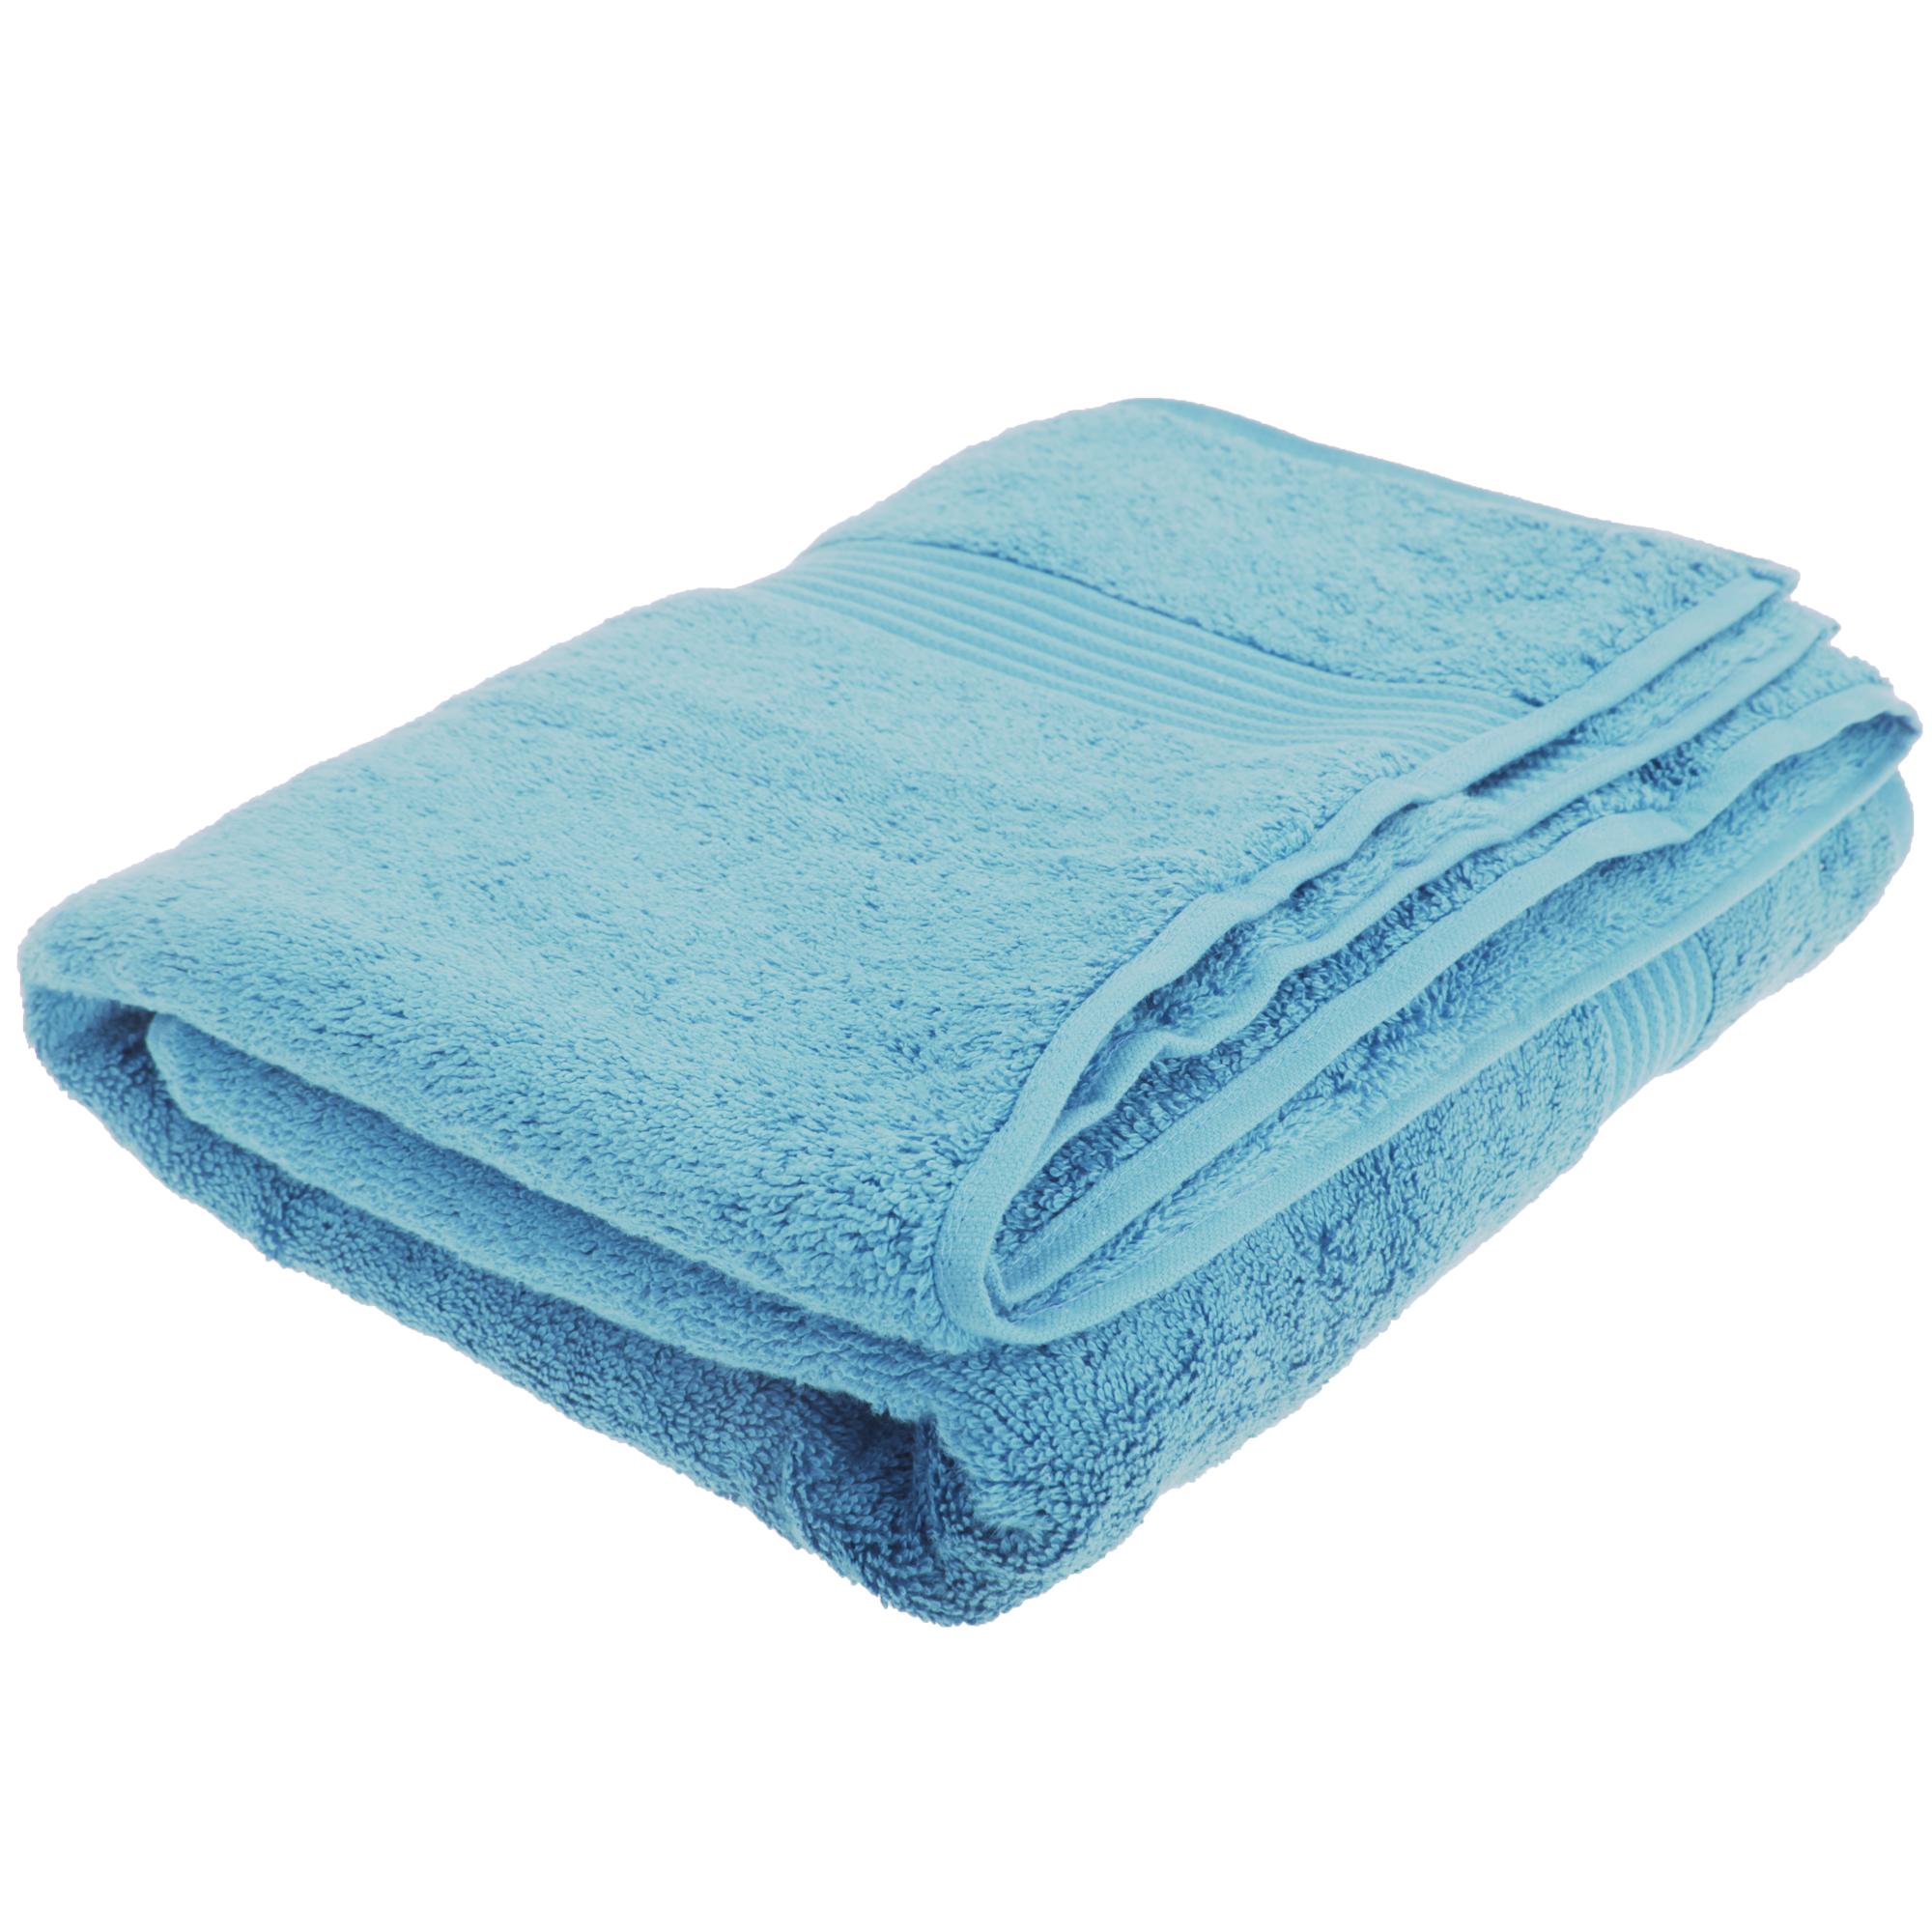 Professional Eco Friendly Bath Towels  Disposable Guest